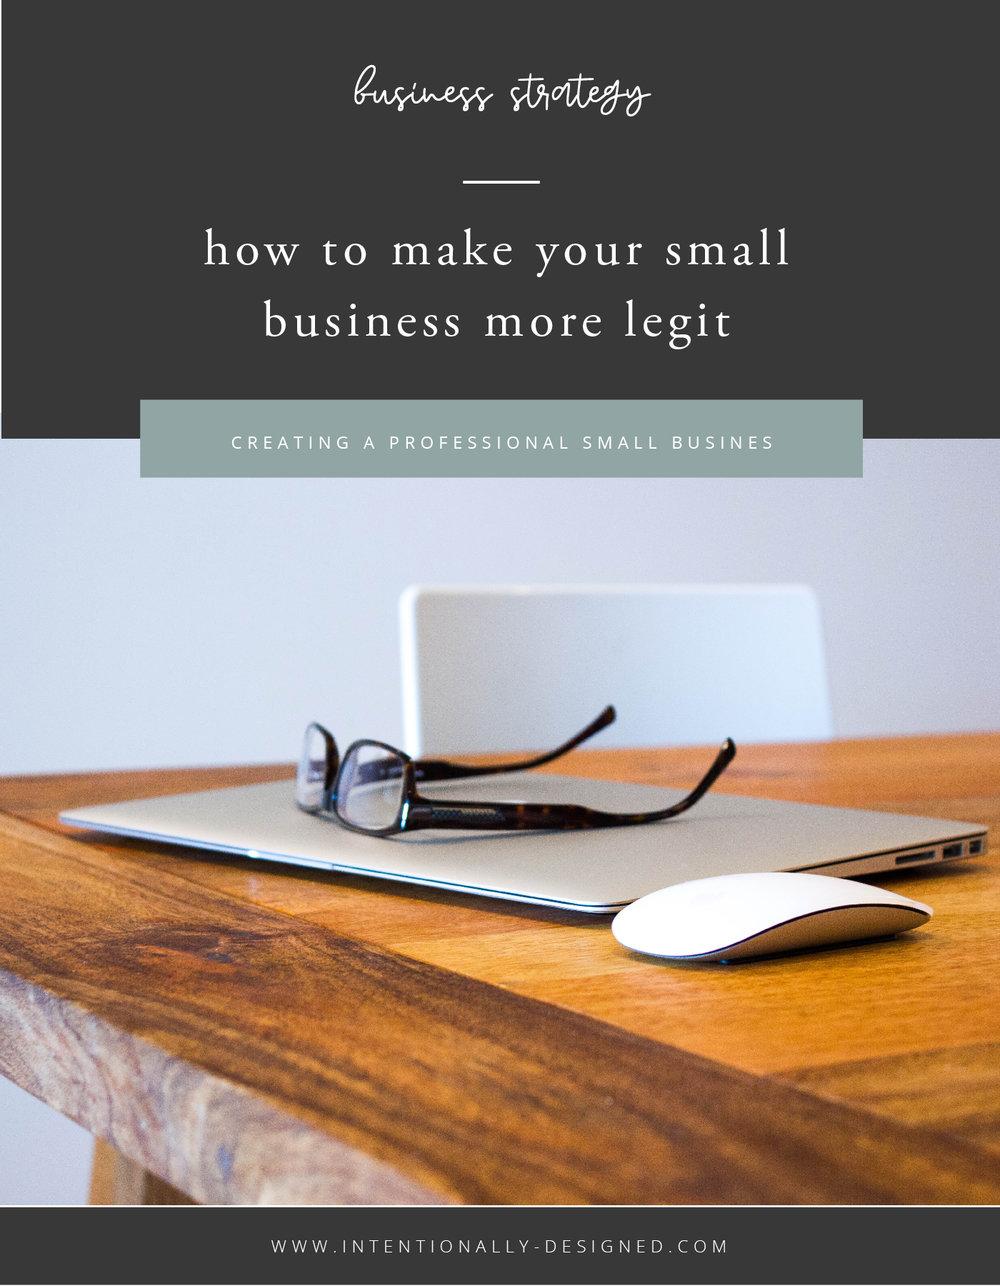 small business more legit